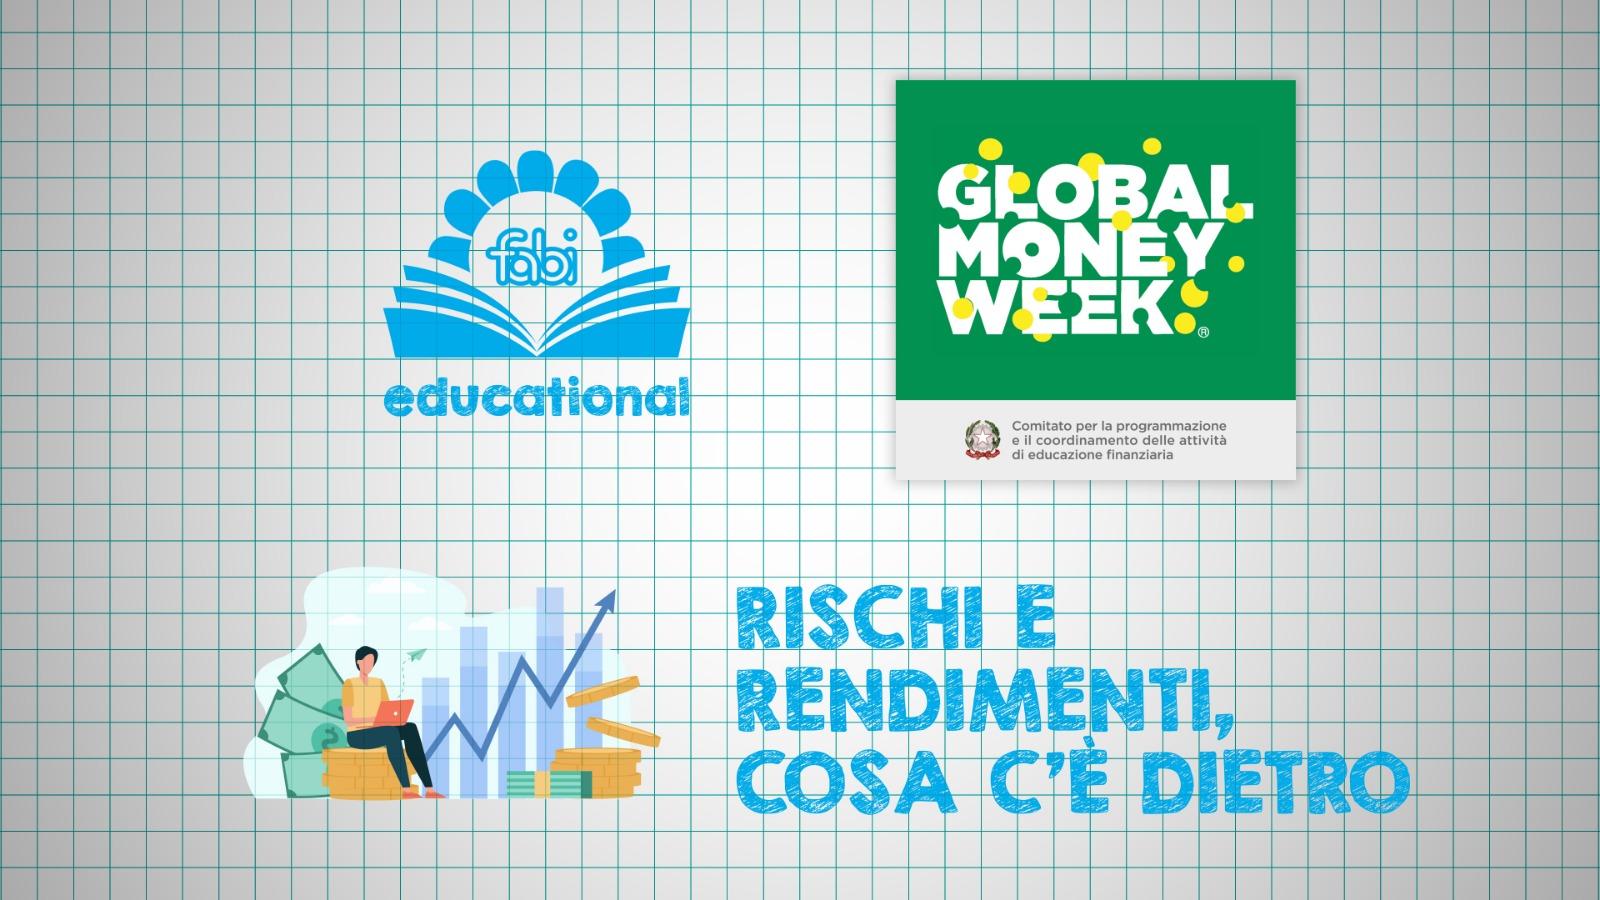 8 - FABI EDUCATIONAL - Rischi e rendimenti, cosa c'è dietro (13-19 anni)